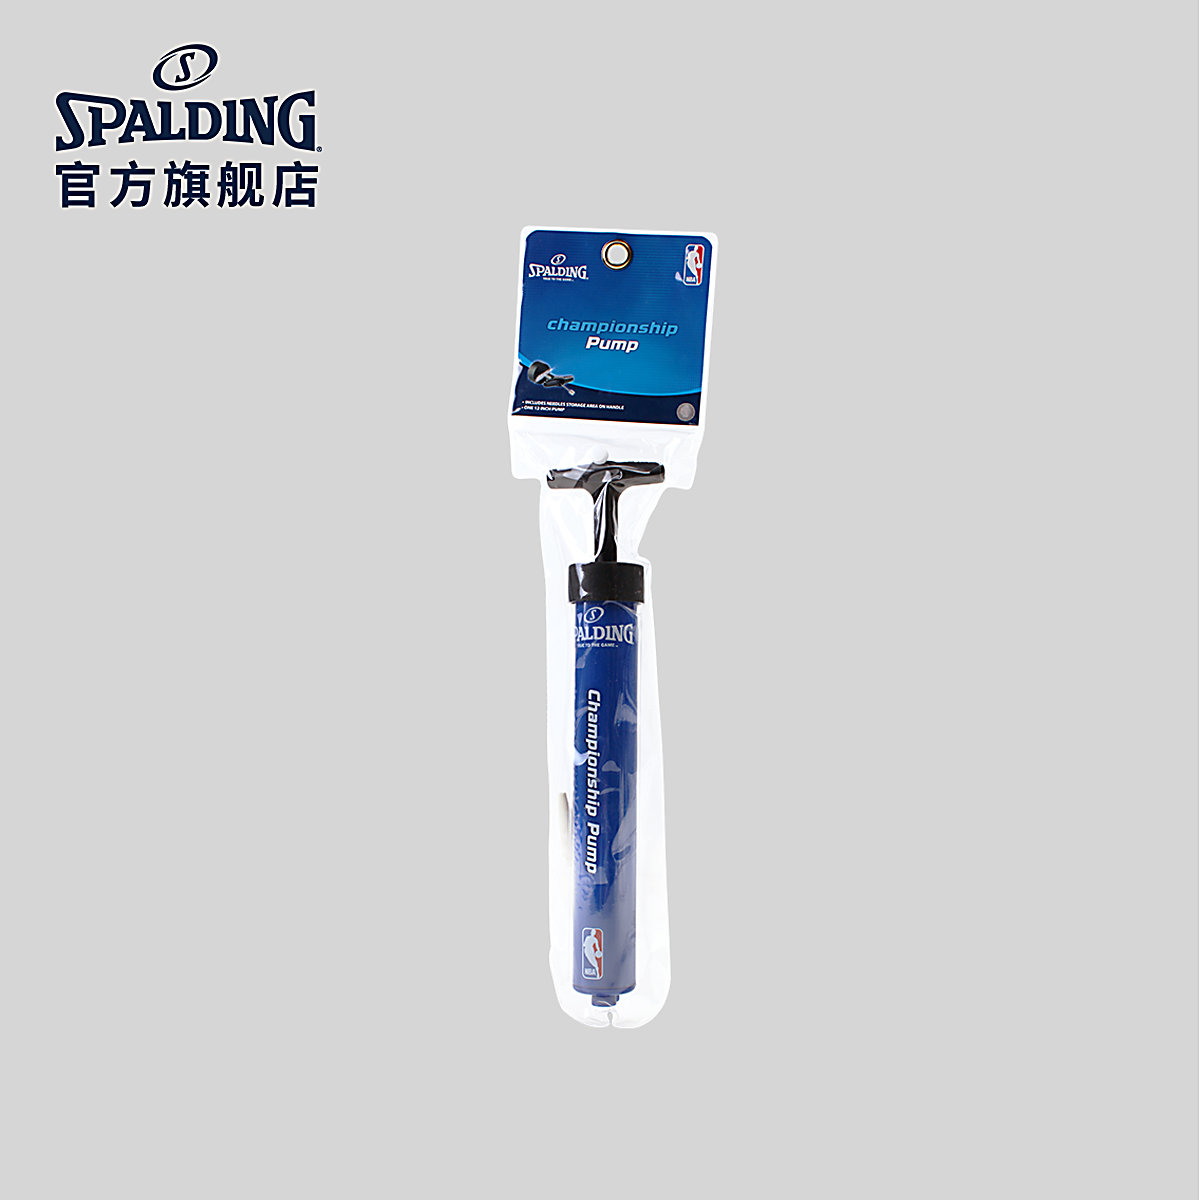 SPALDING官方旗艦店(斯伯丁)打氣筒 8306SR